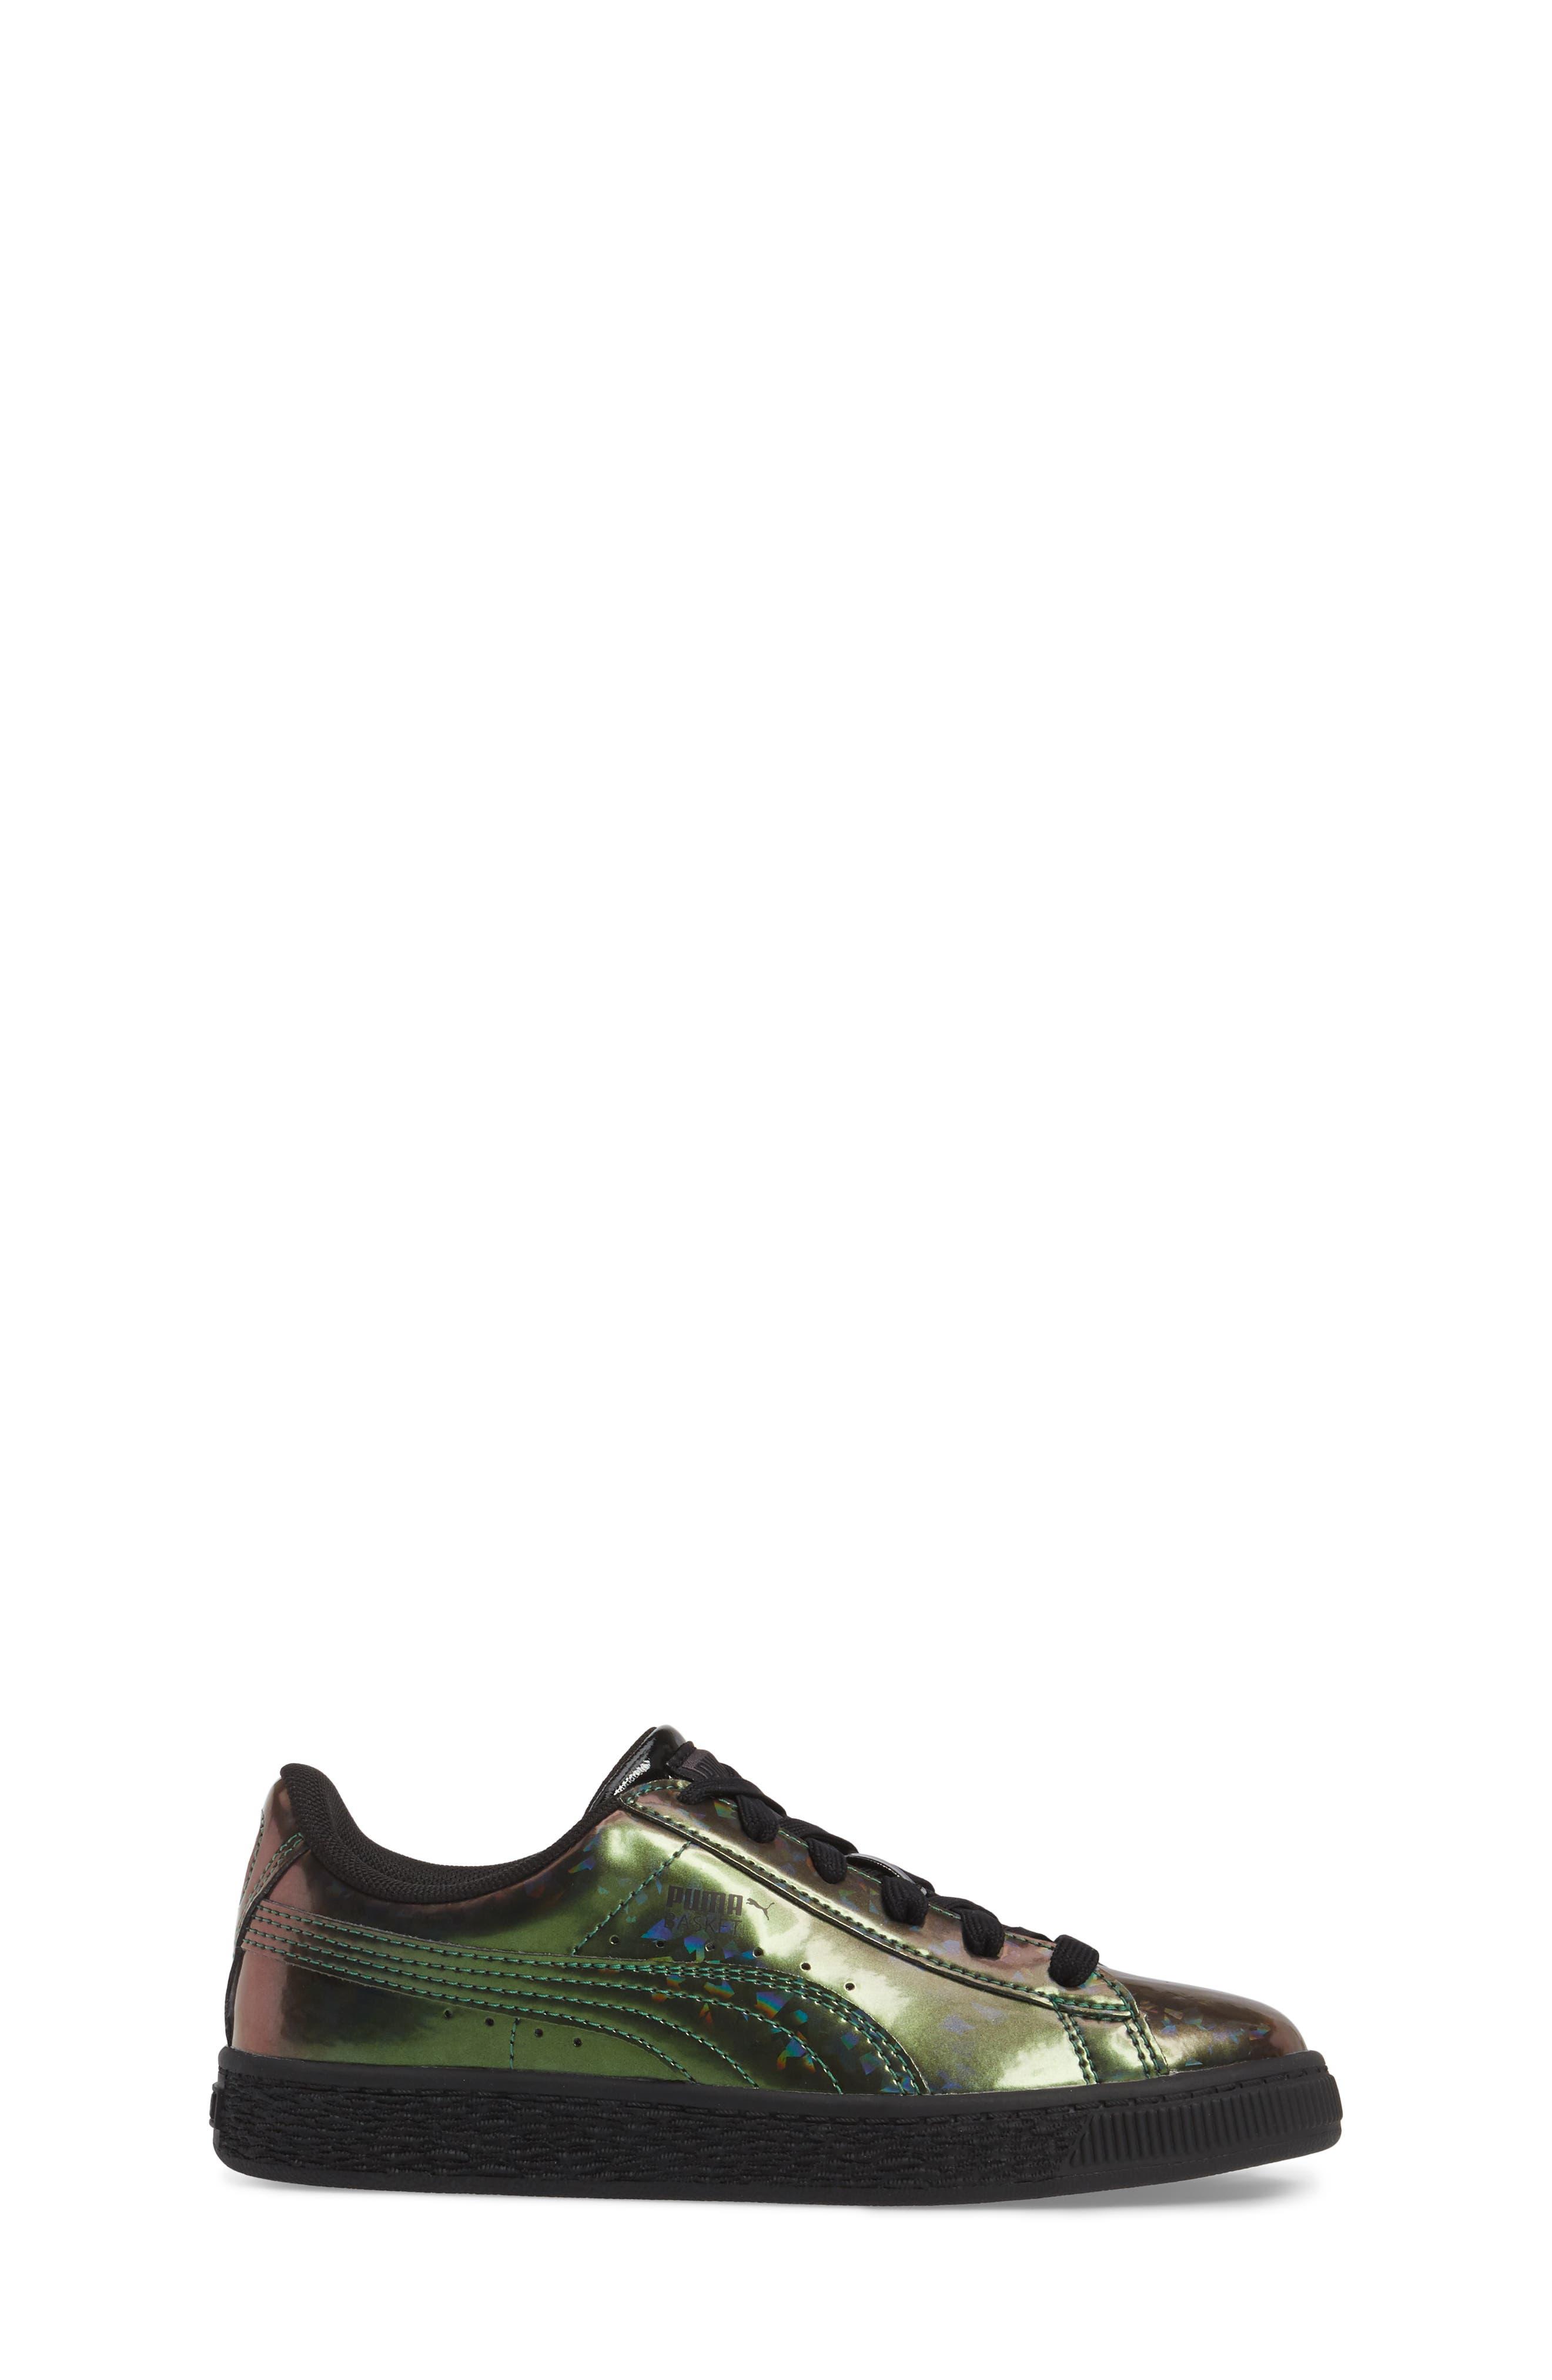 Basket Classic Holo PS Sneaker,                             Alternate thumbnail 3, color,                             Black/ Black